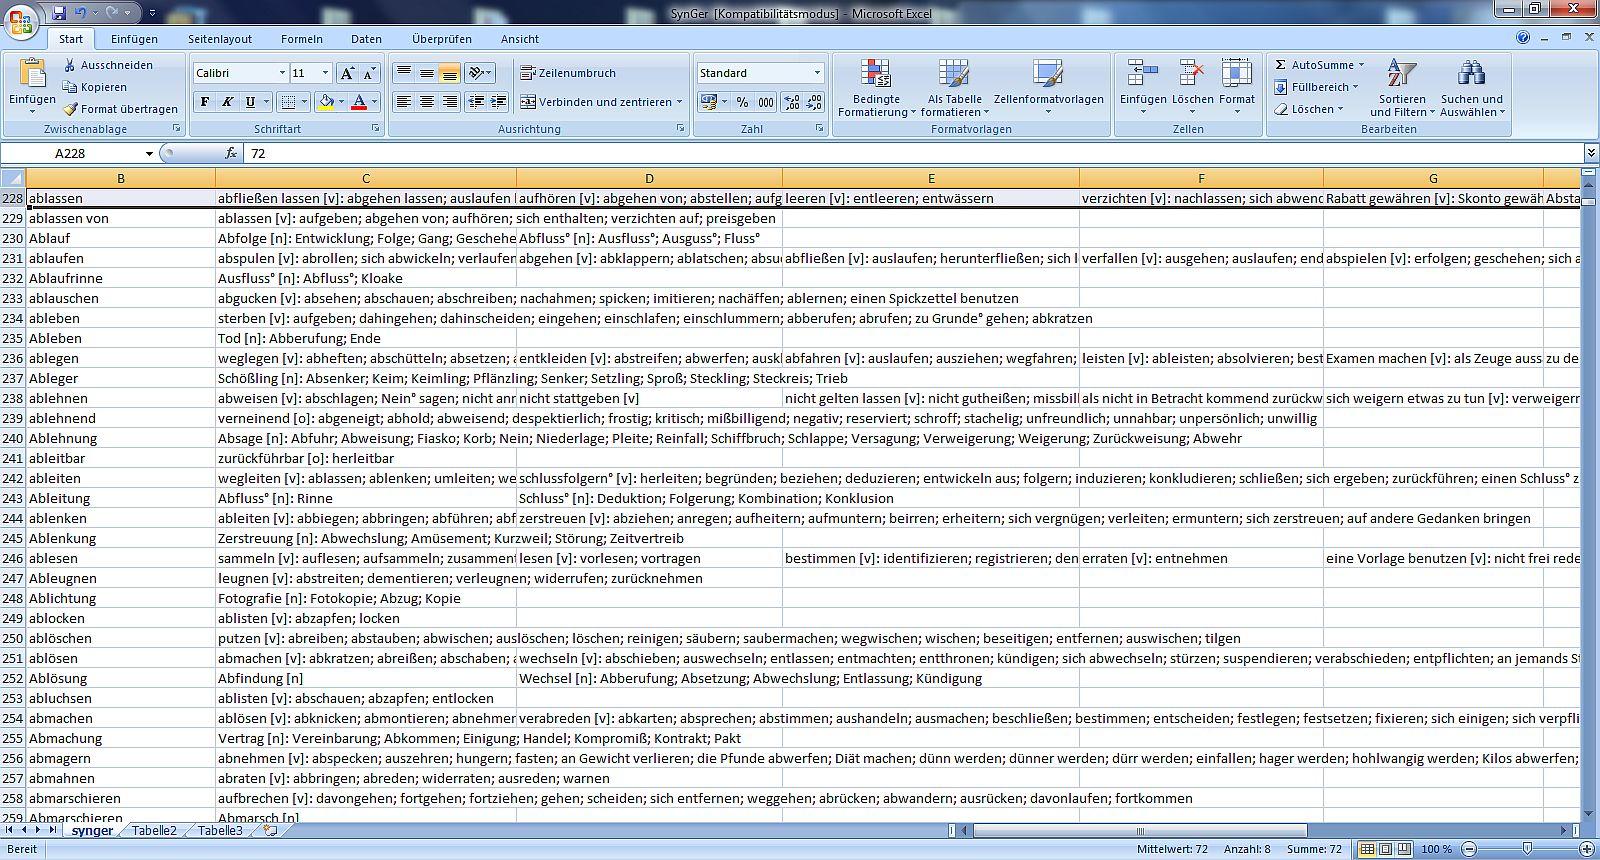 English In Italian: TT- Software/ Databases: Synonymlexika, Thesaurus- Database